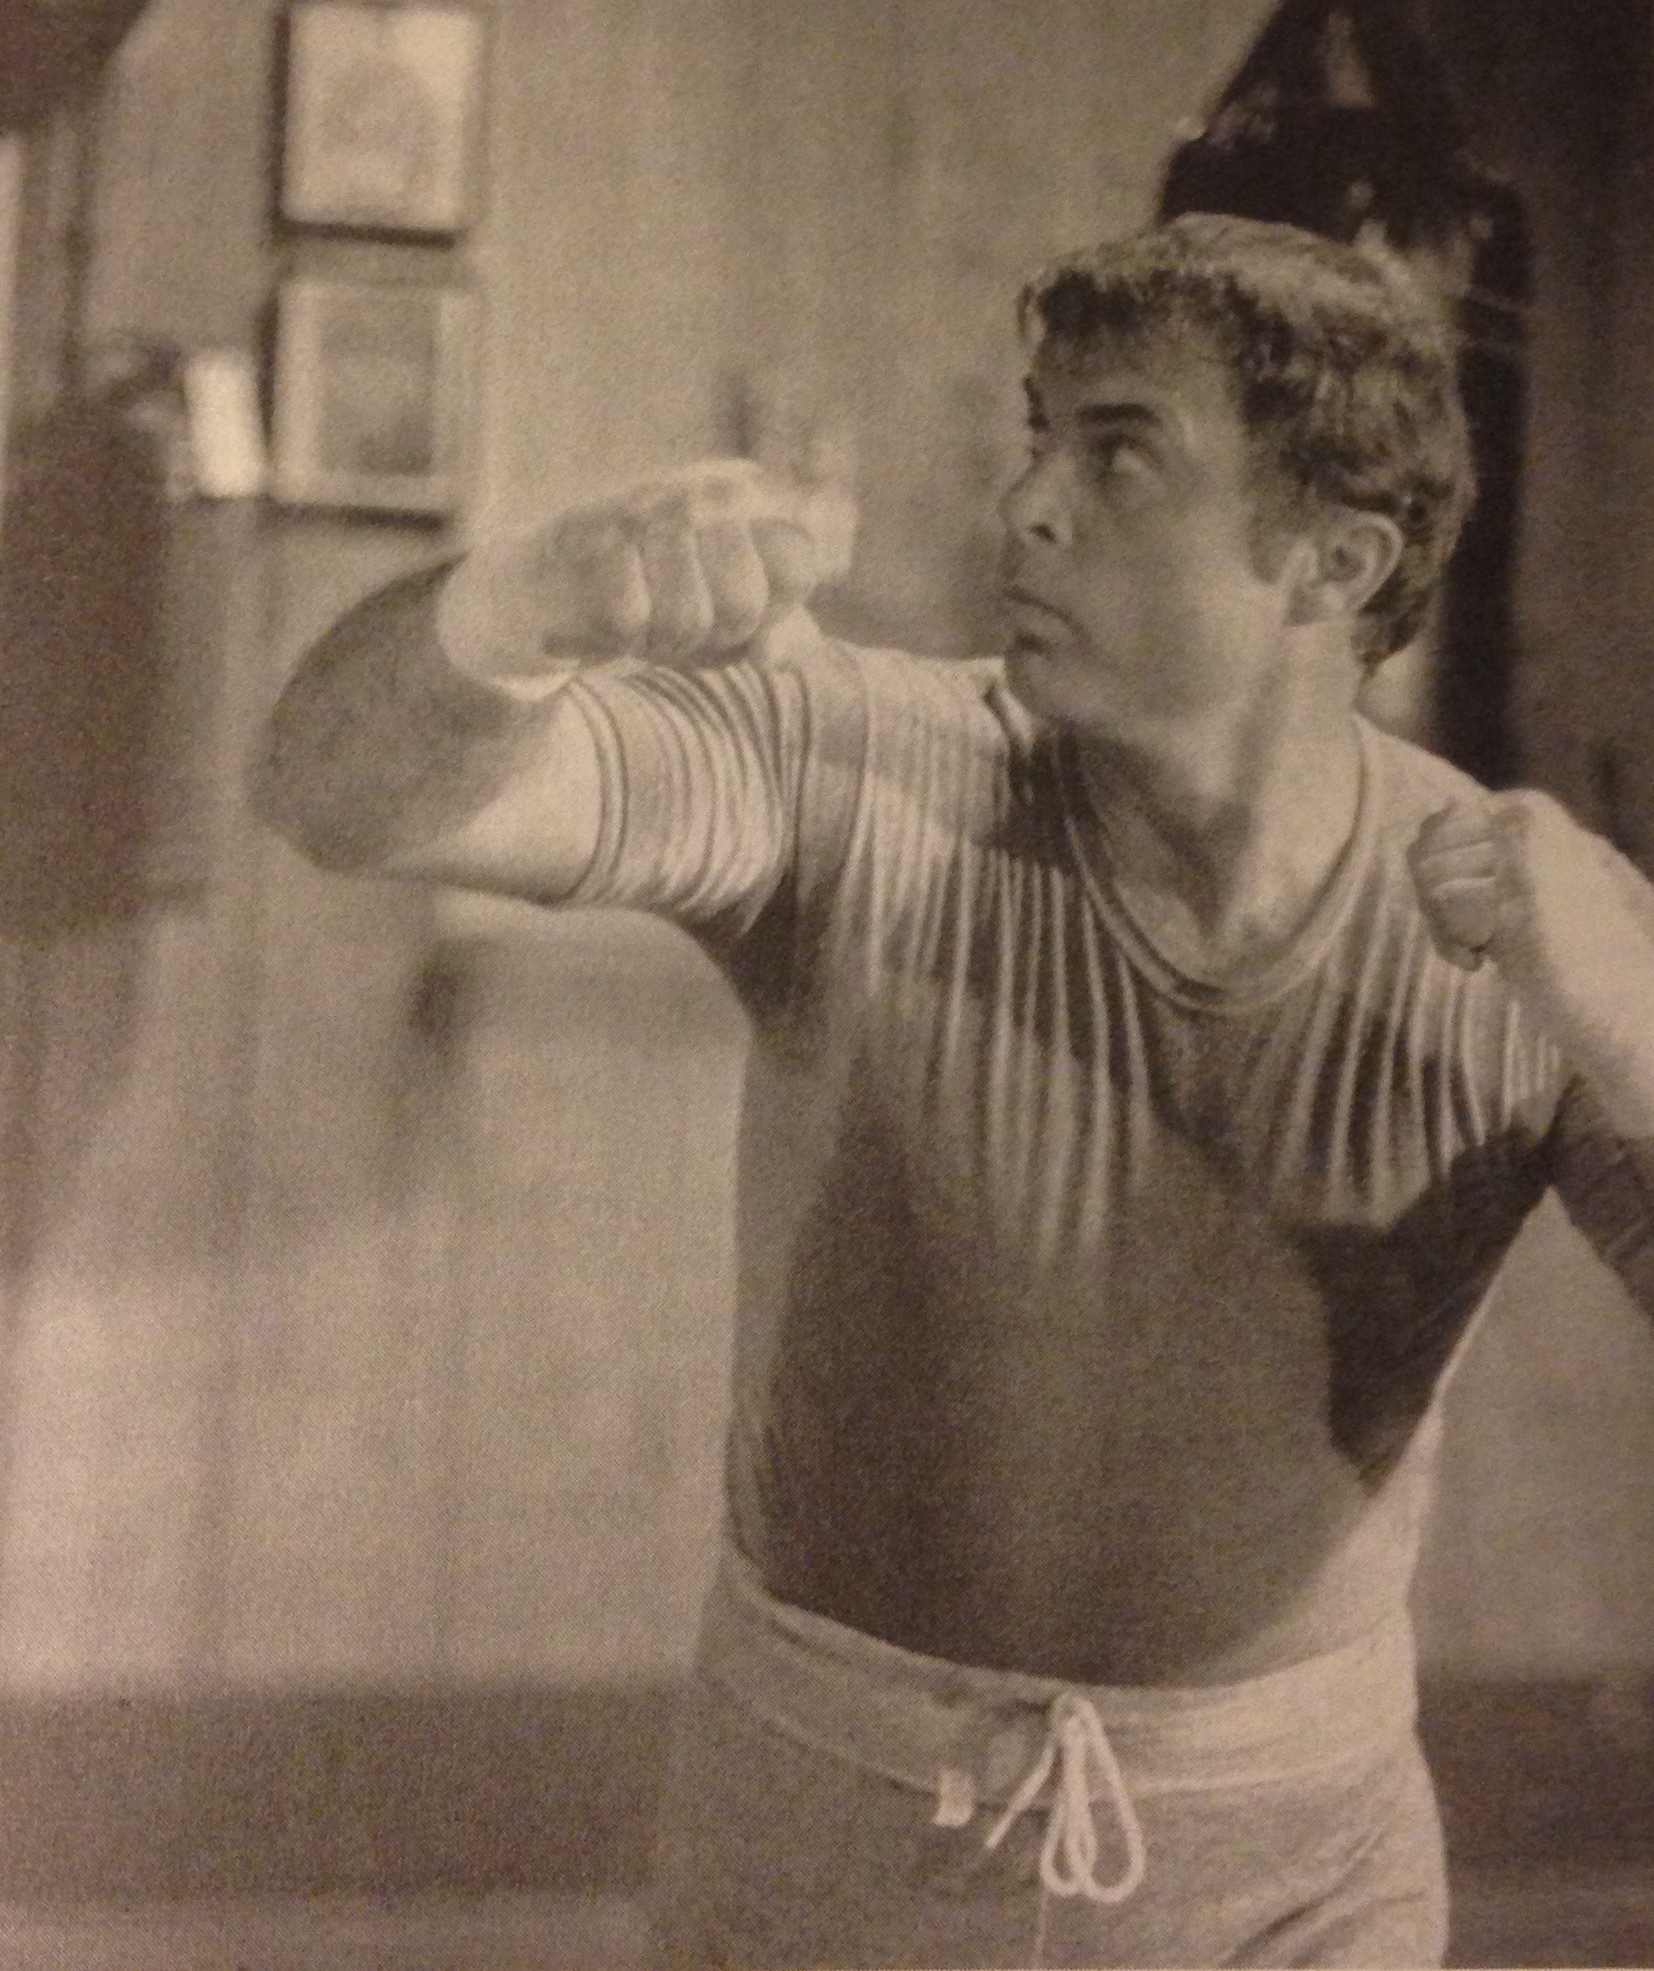 Robert Conrad in The Duke (1979)